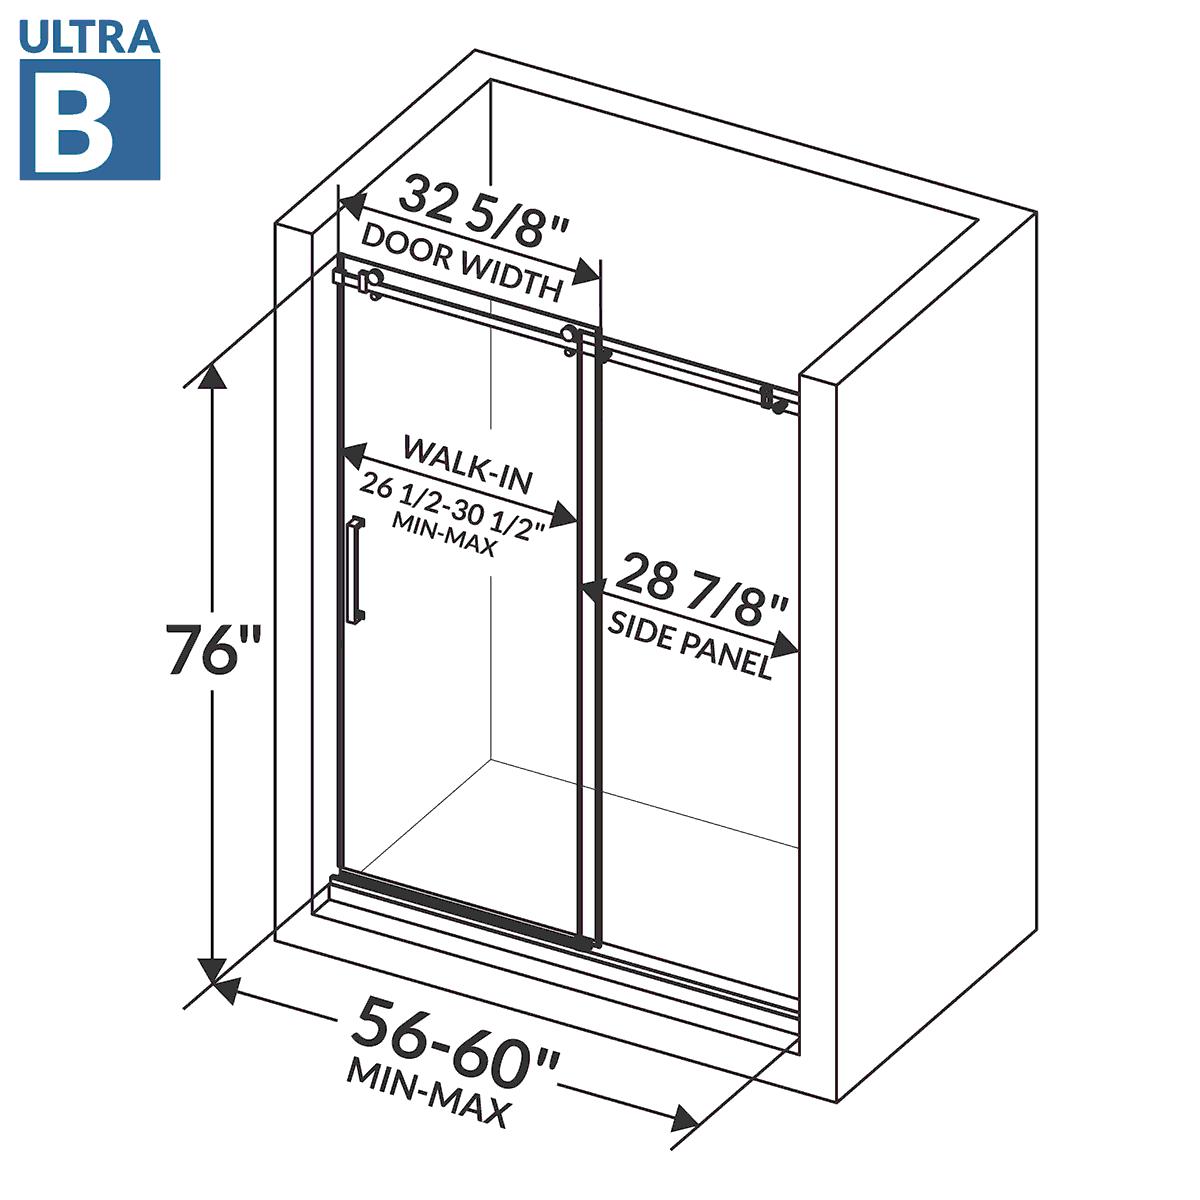 Shower Door Frameless 56 60 W X 76 H Ultra B Brushed